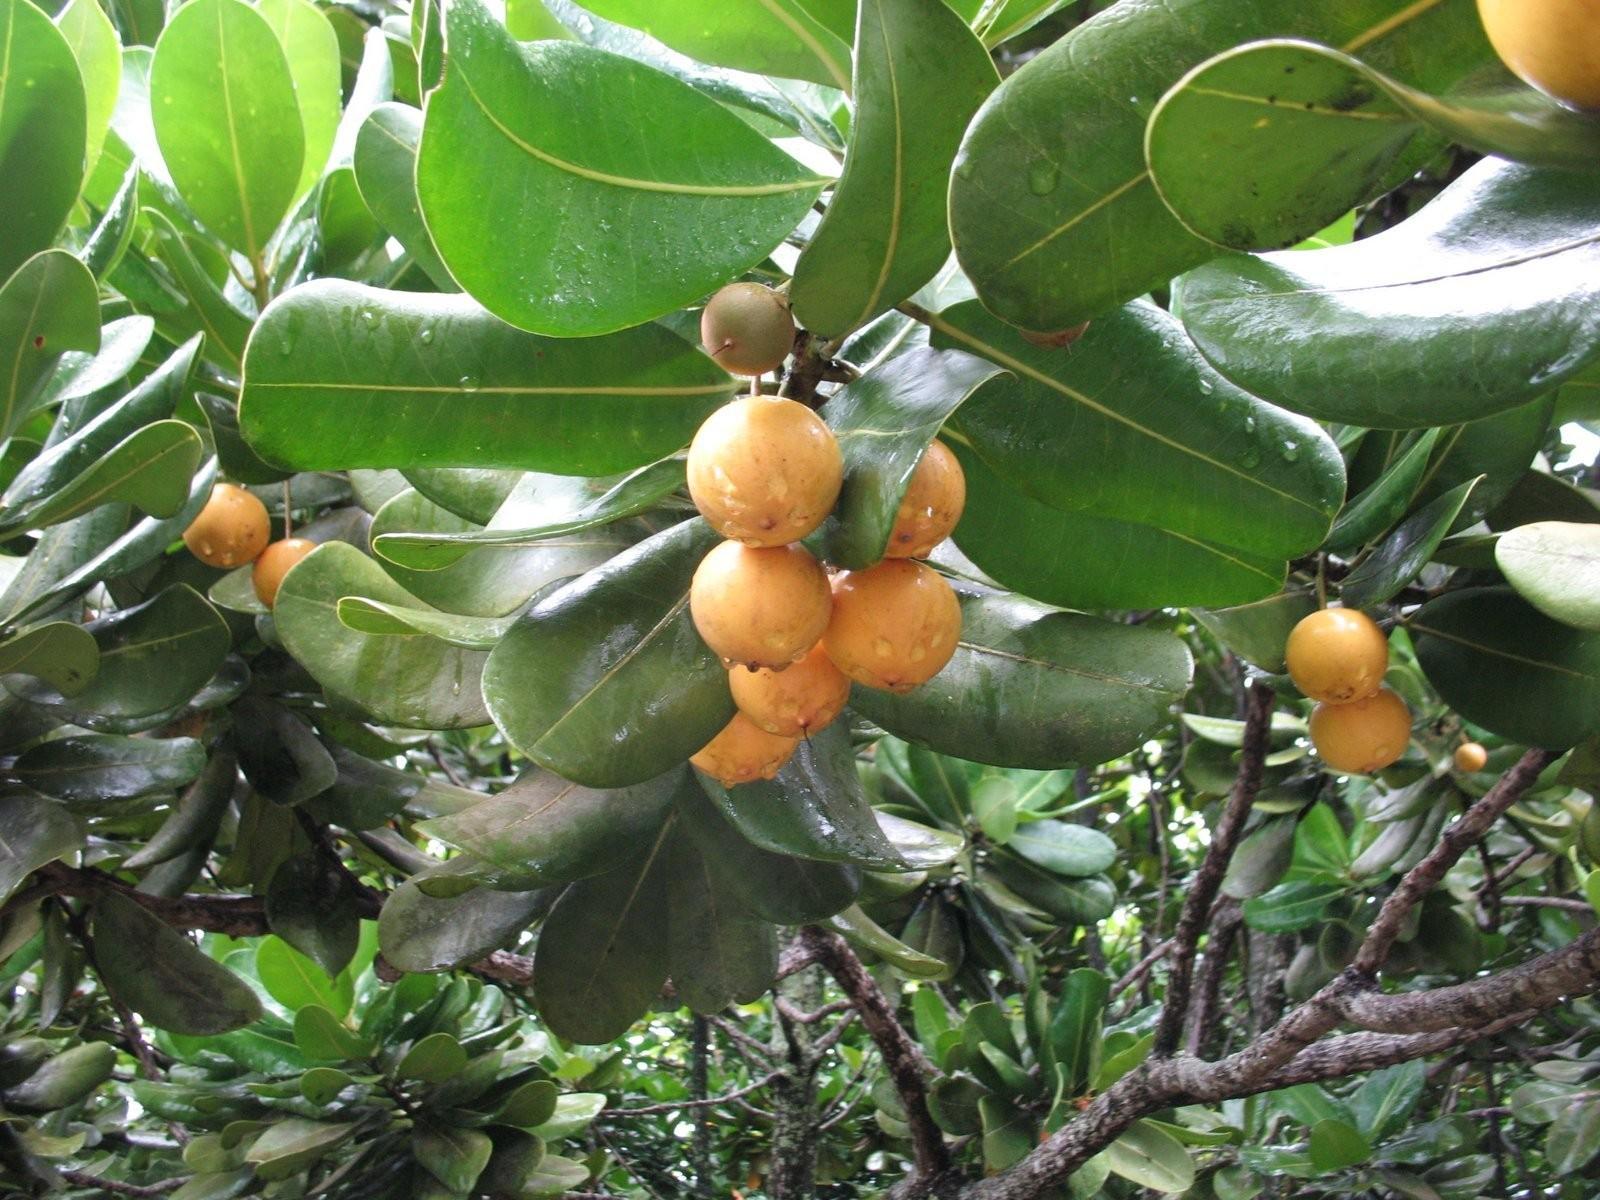 Como Plantar Bacuri - colheita